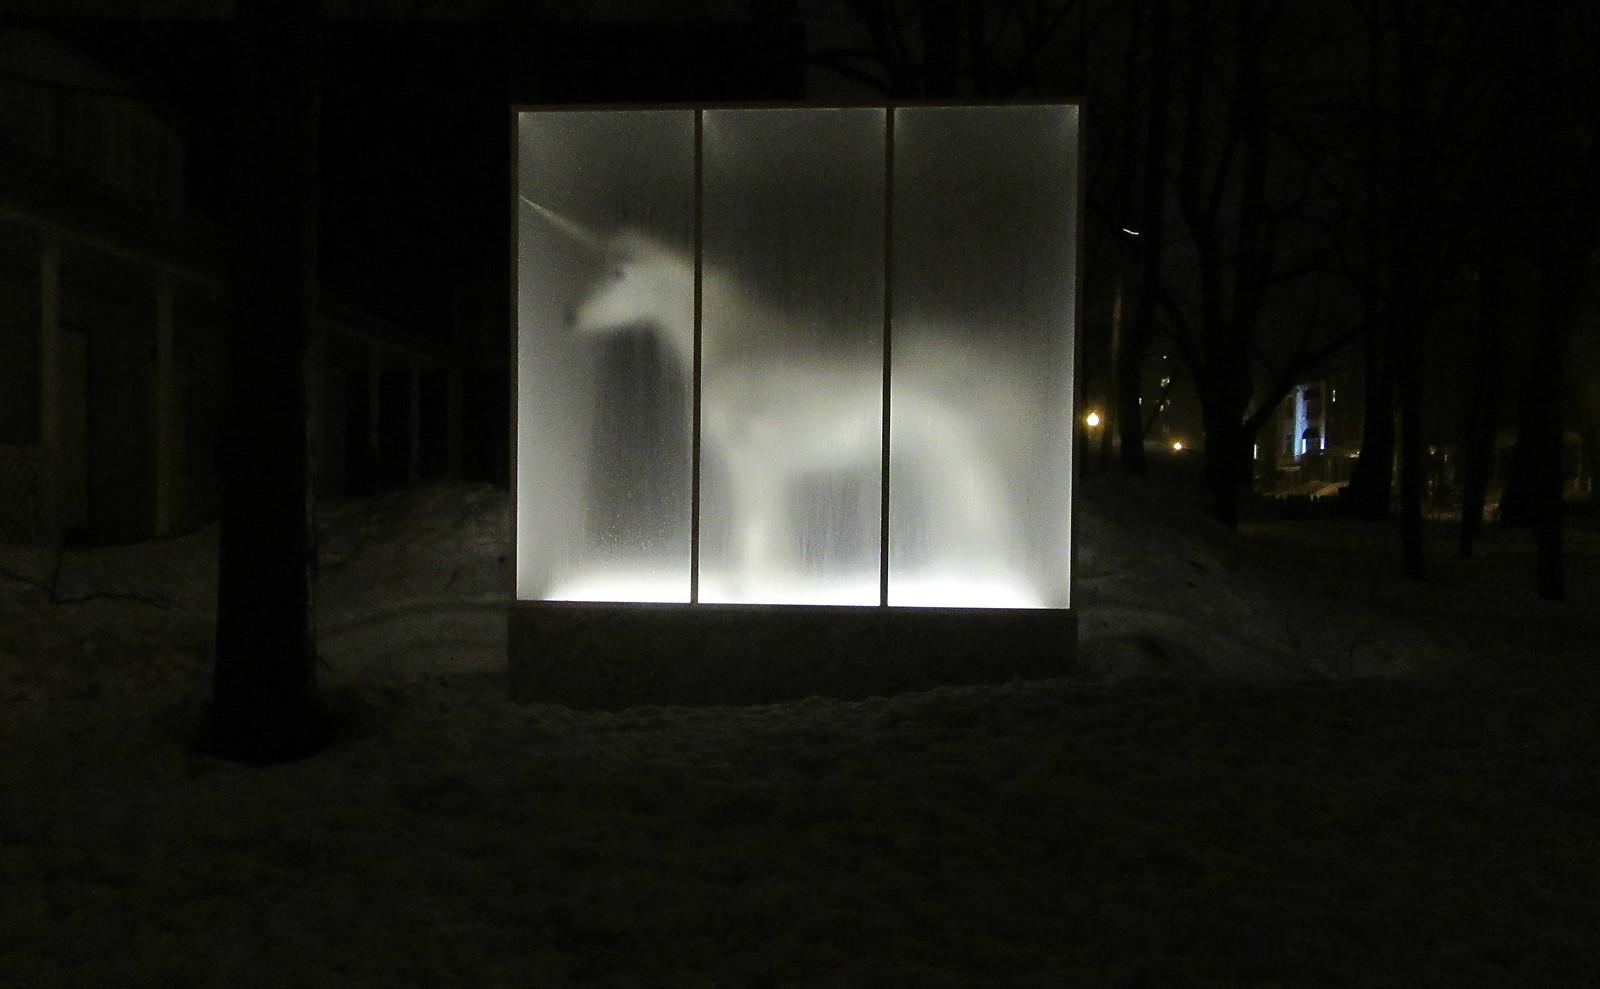 La Licorne sort en boîte... | by Robert Saucier